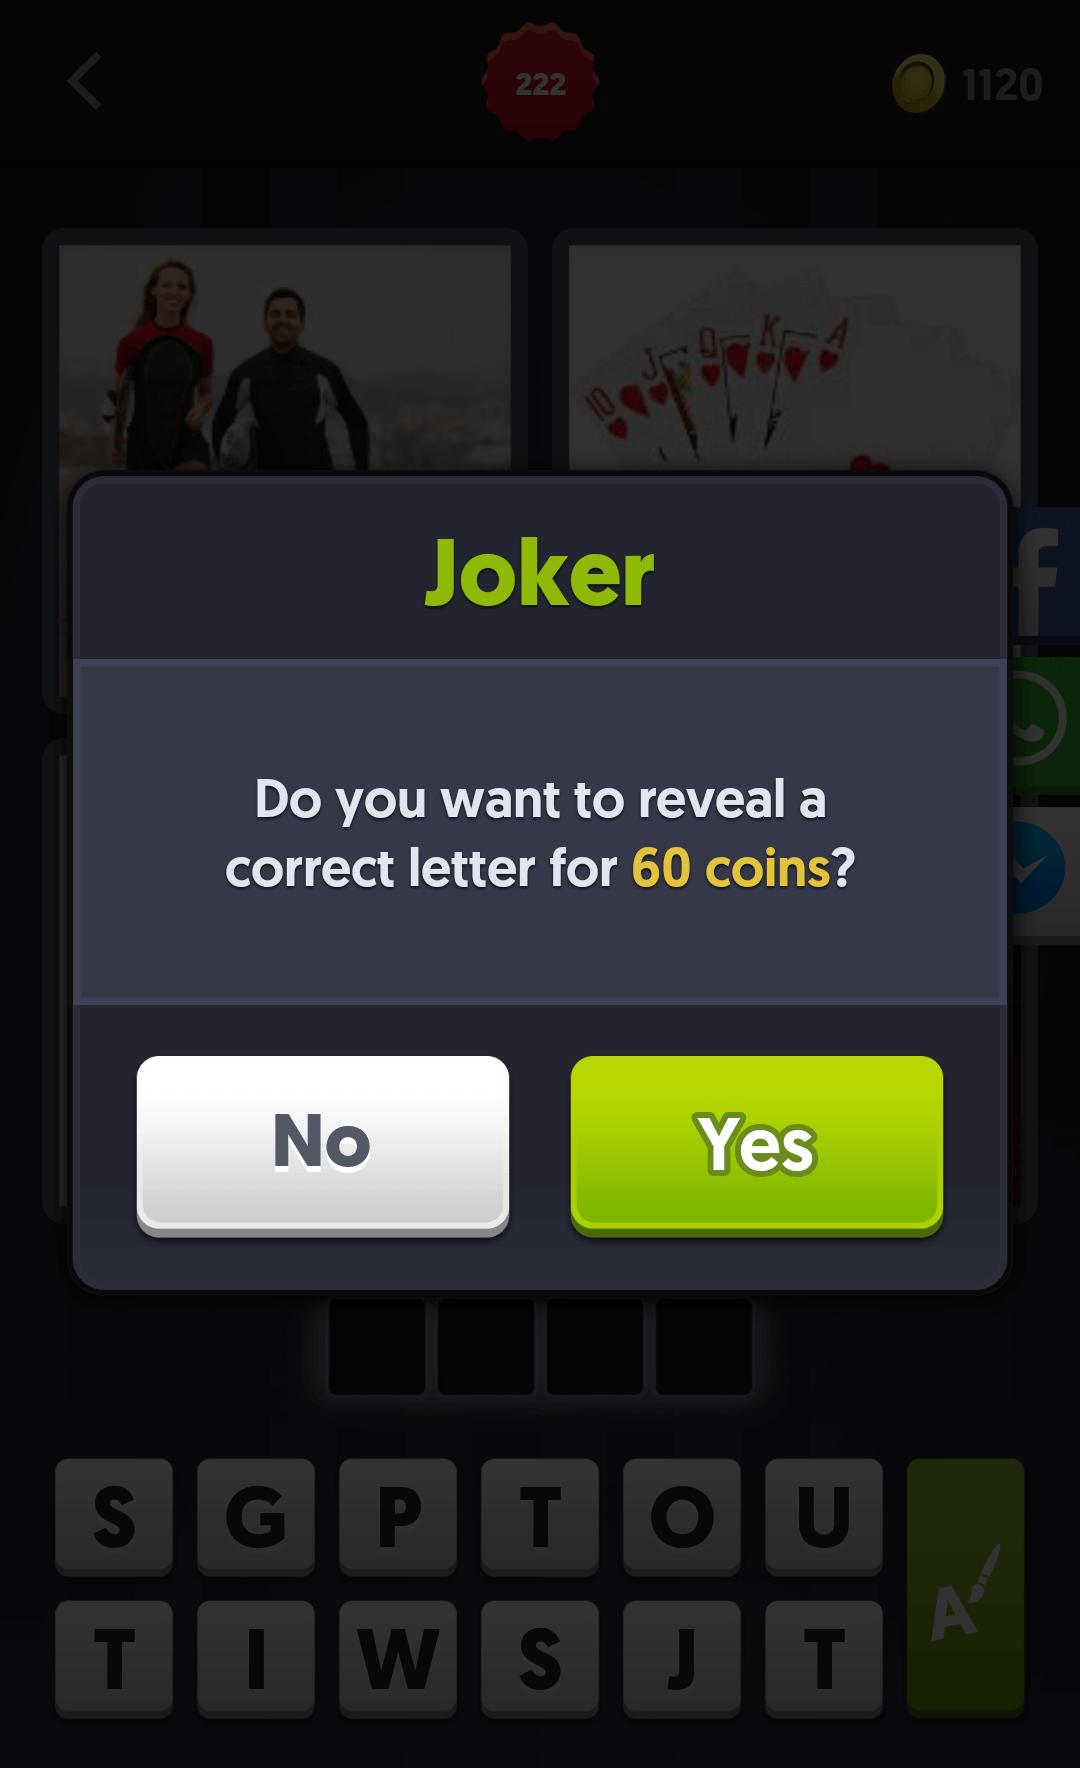 4 Pics 1 Word Use The Joker